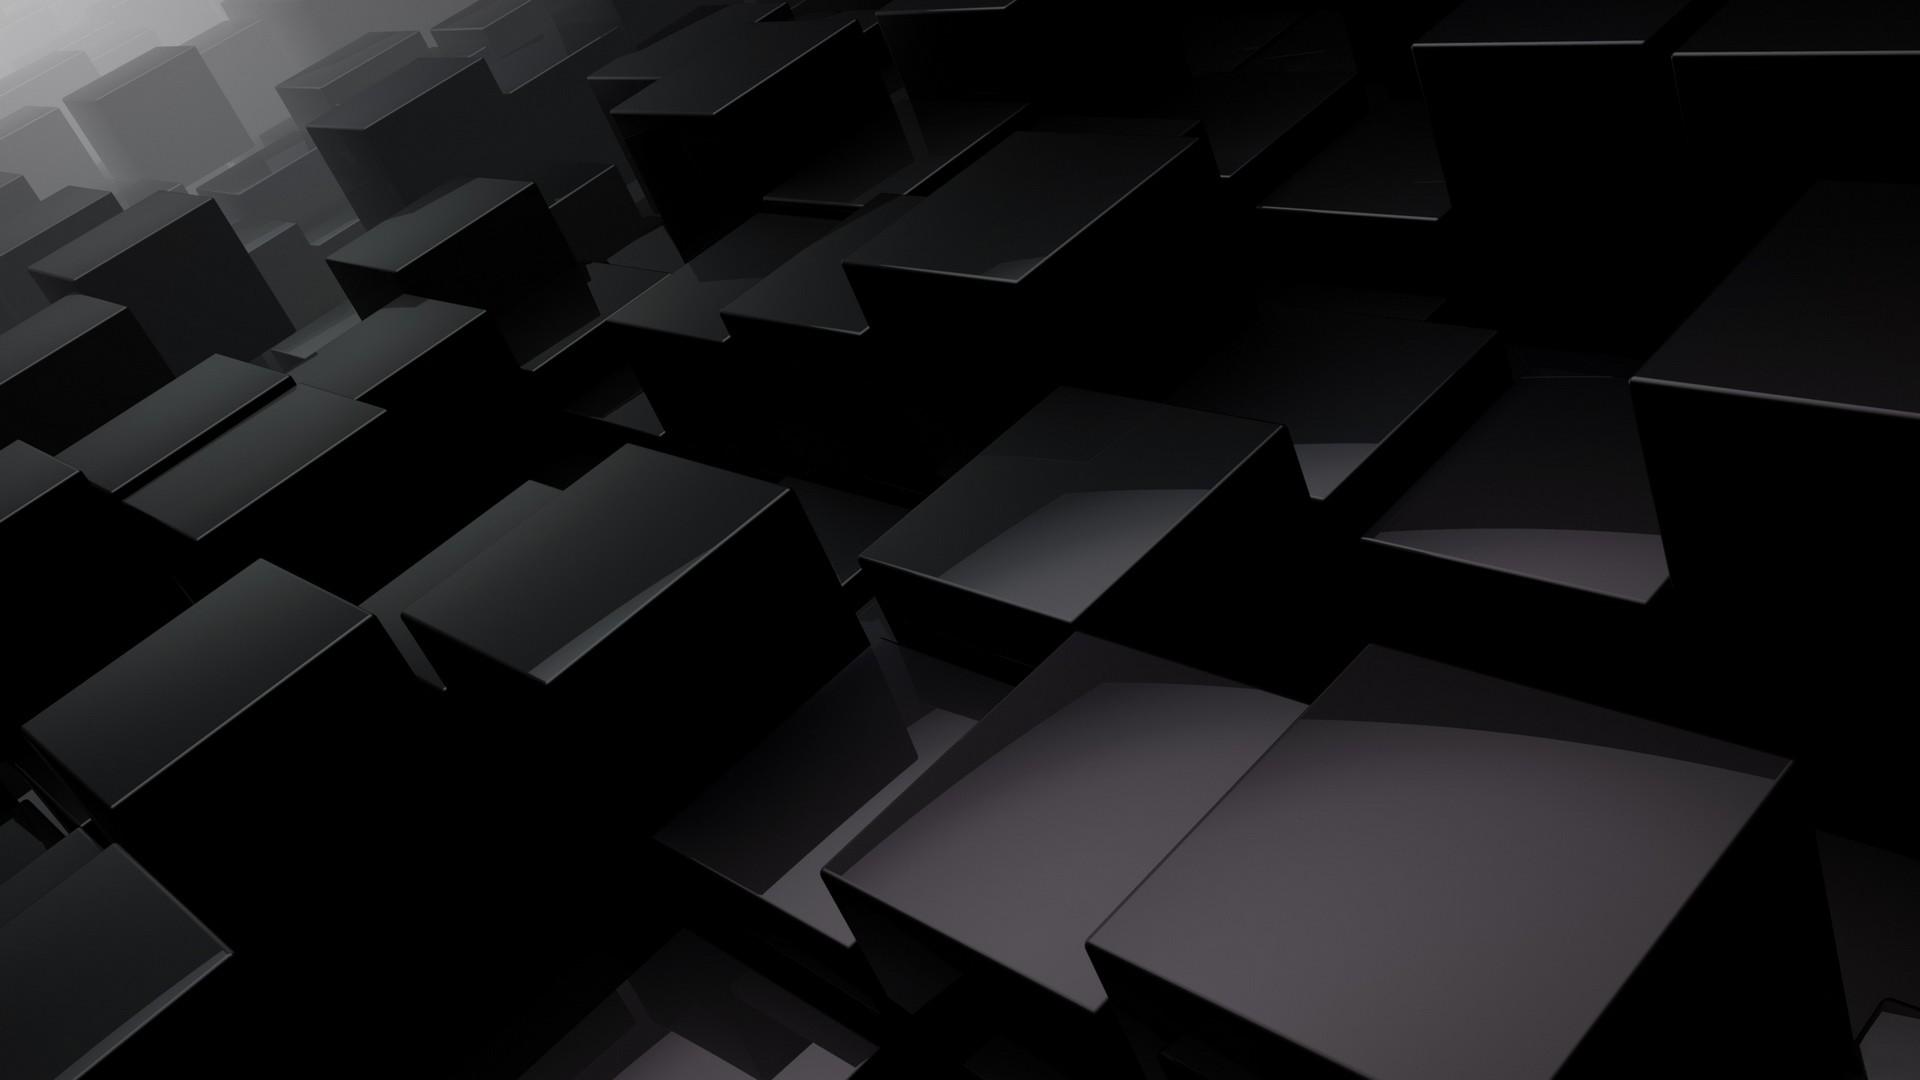 dark color wallpaper (72+ images)